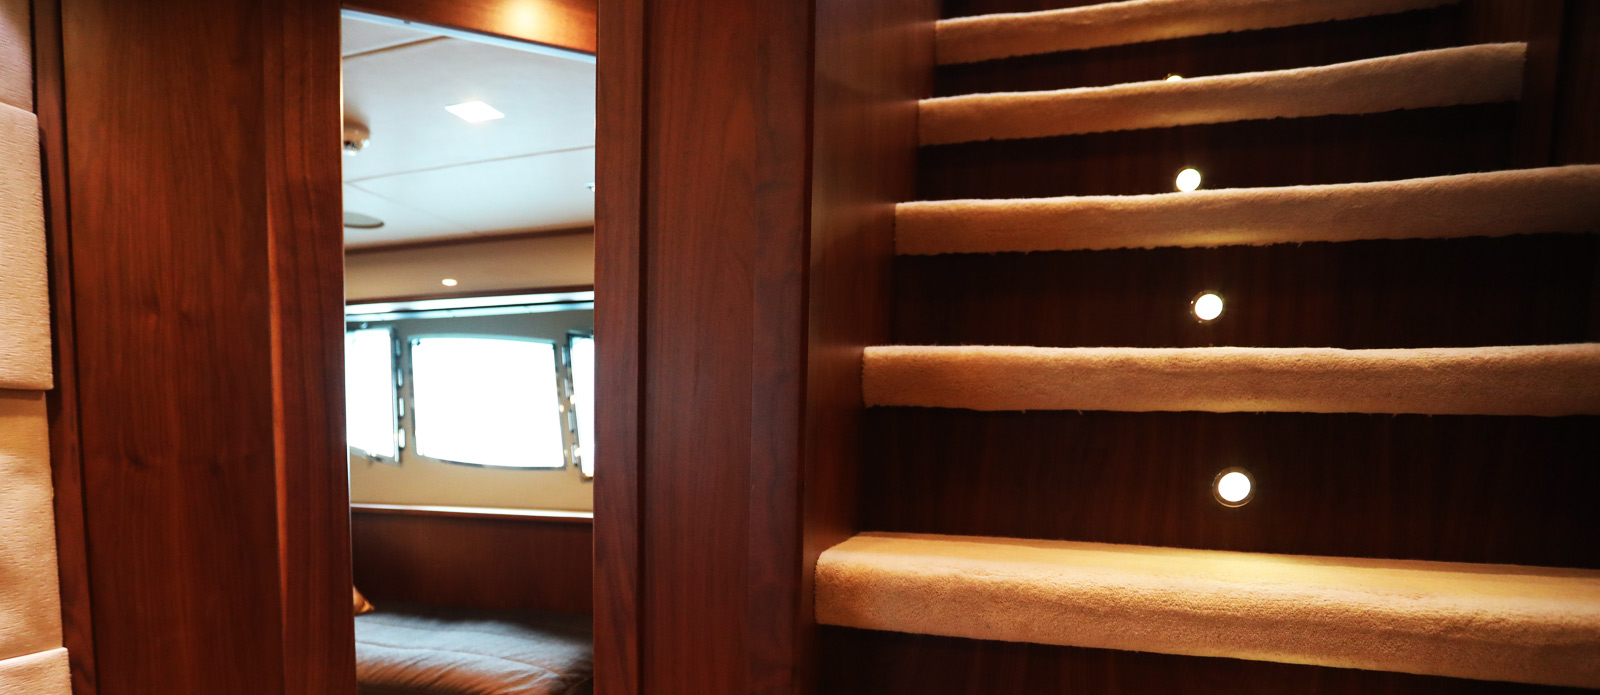 Sunseeker-30-Metre-Yacht-Coraysa-Lower-Deck-Lobby